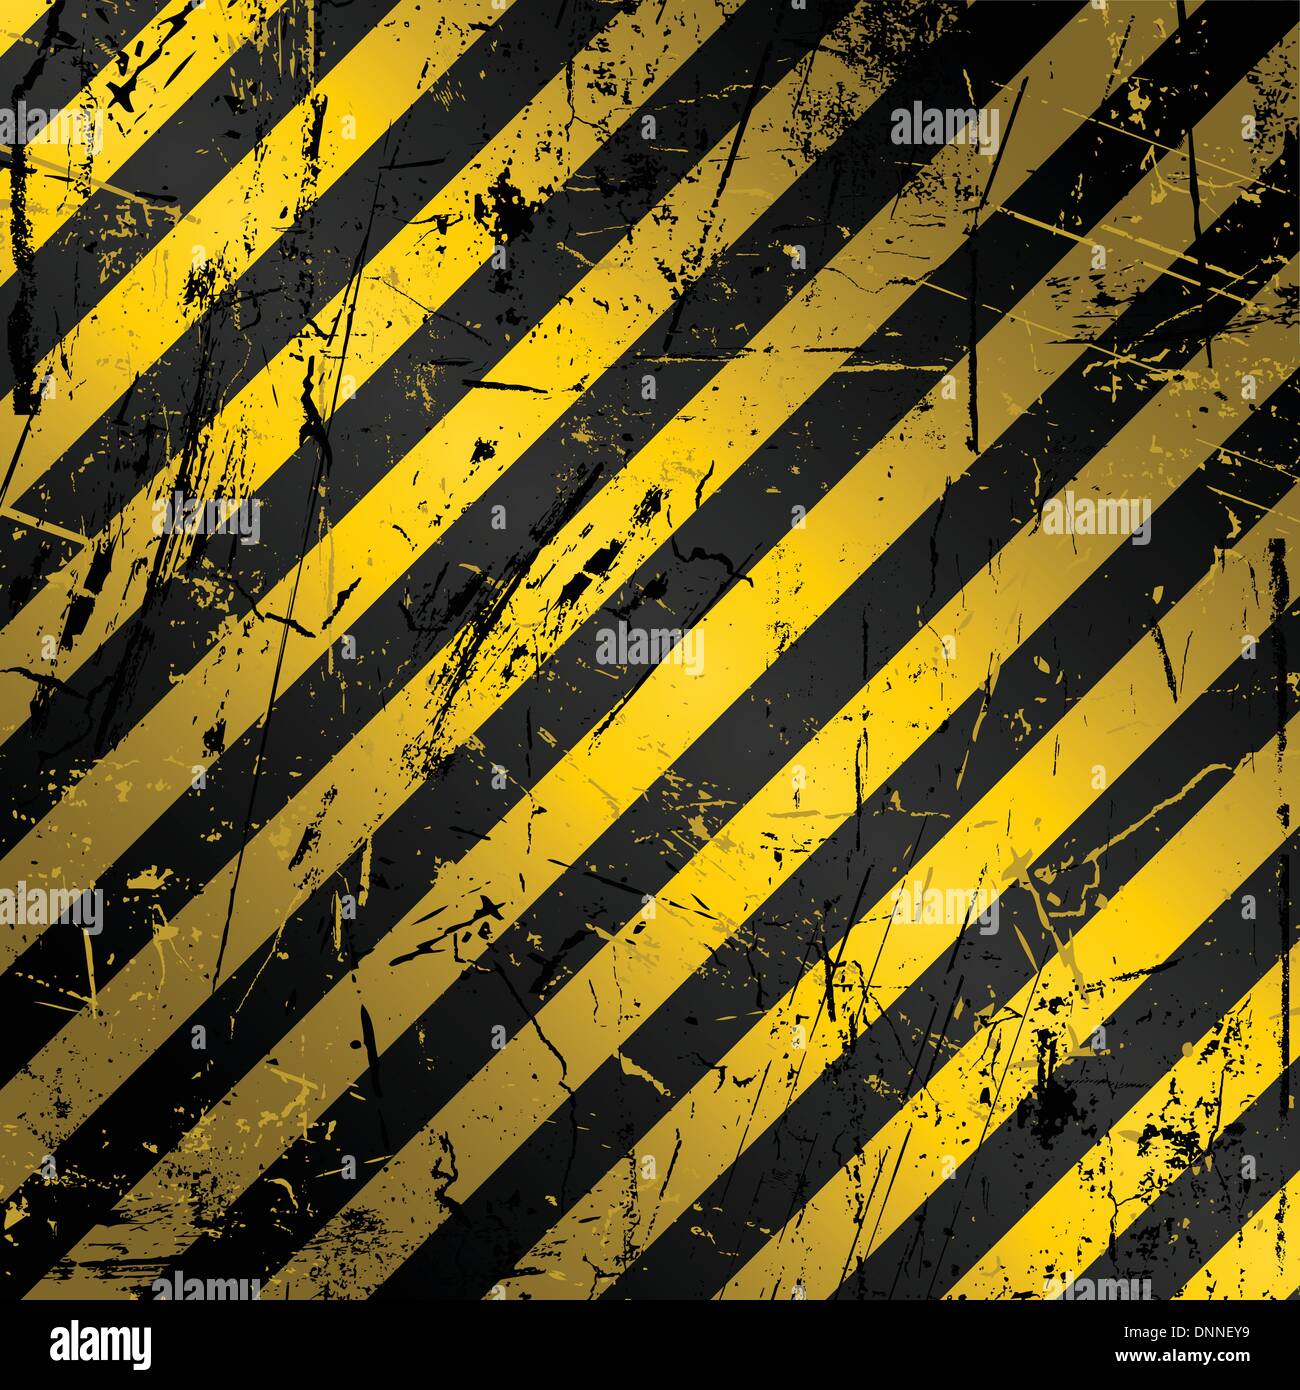 Grunge Textured background construction en jaune et noir Photo Stock